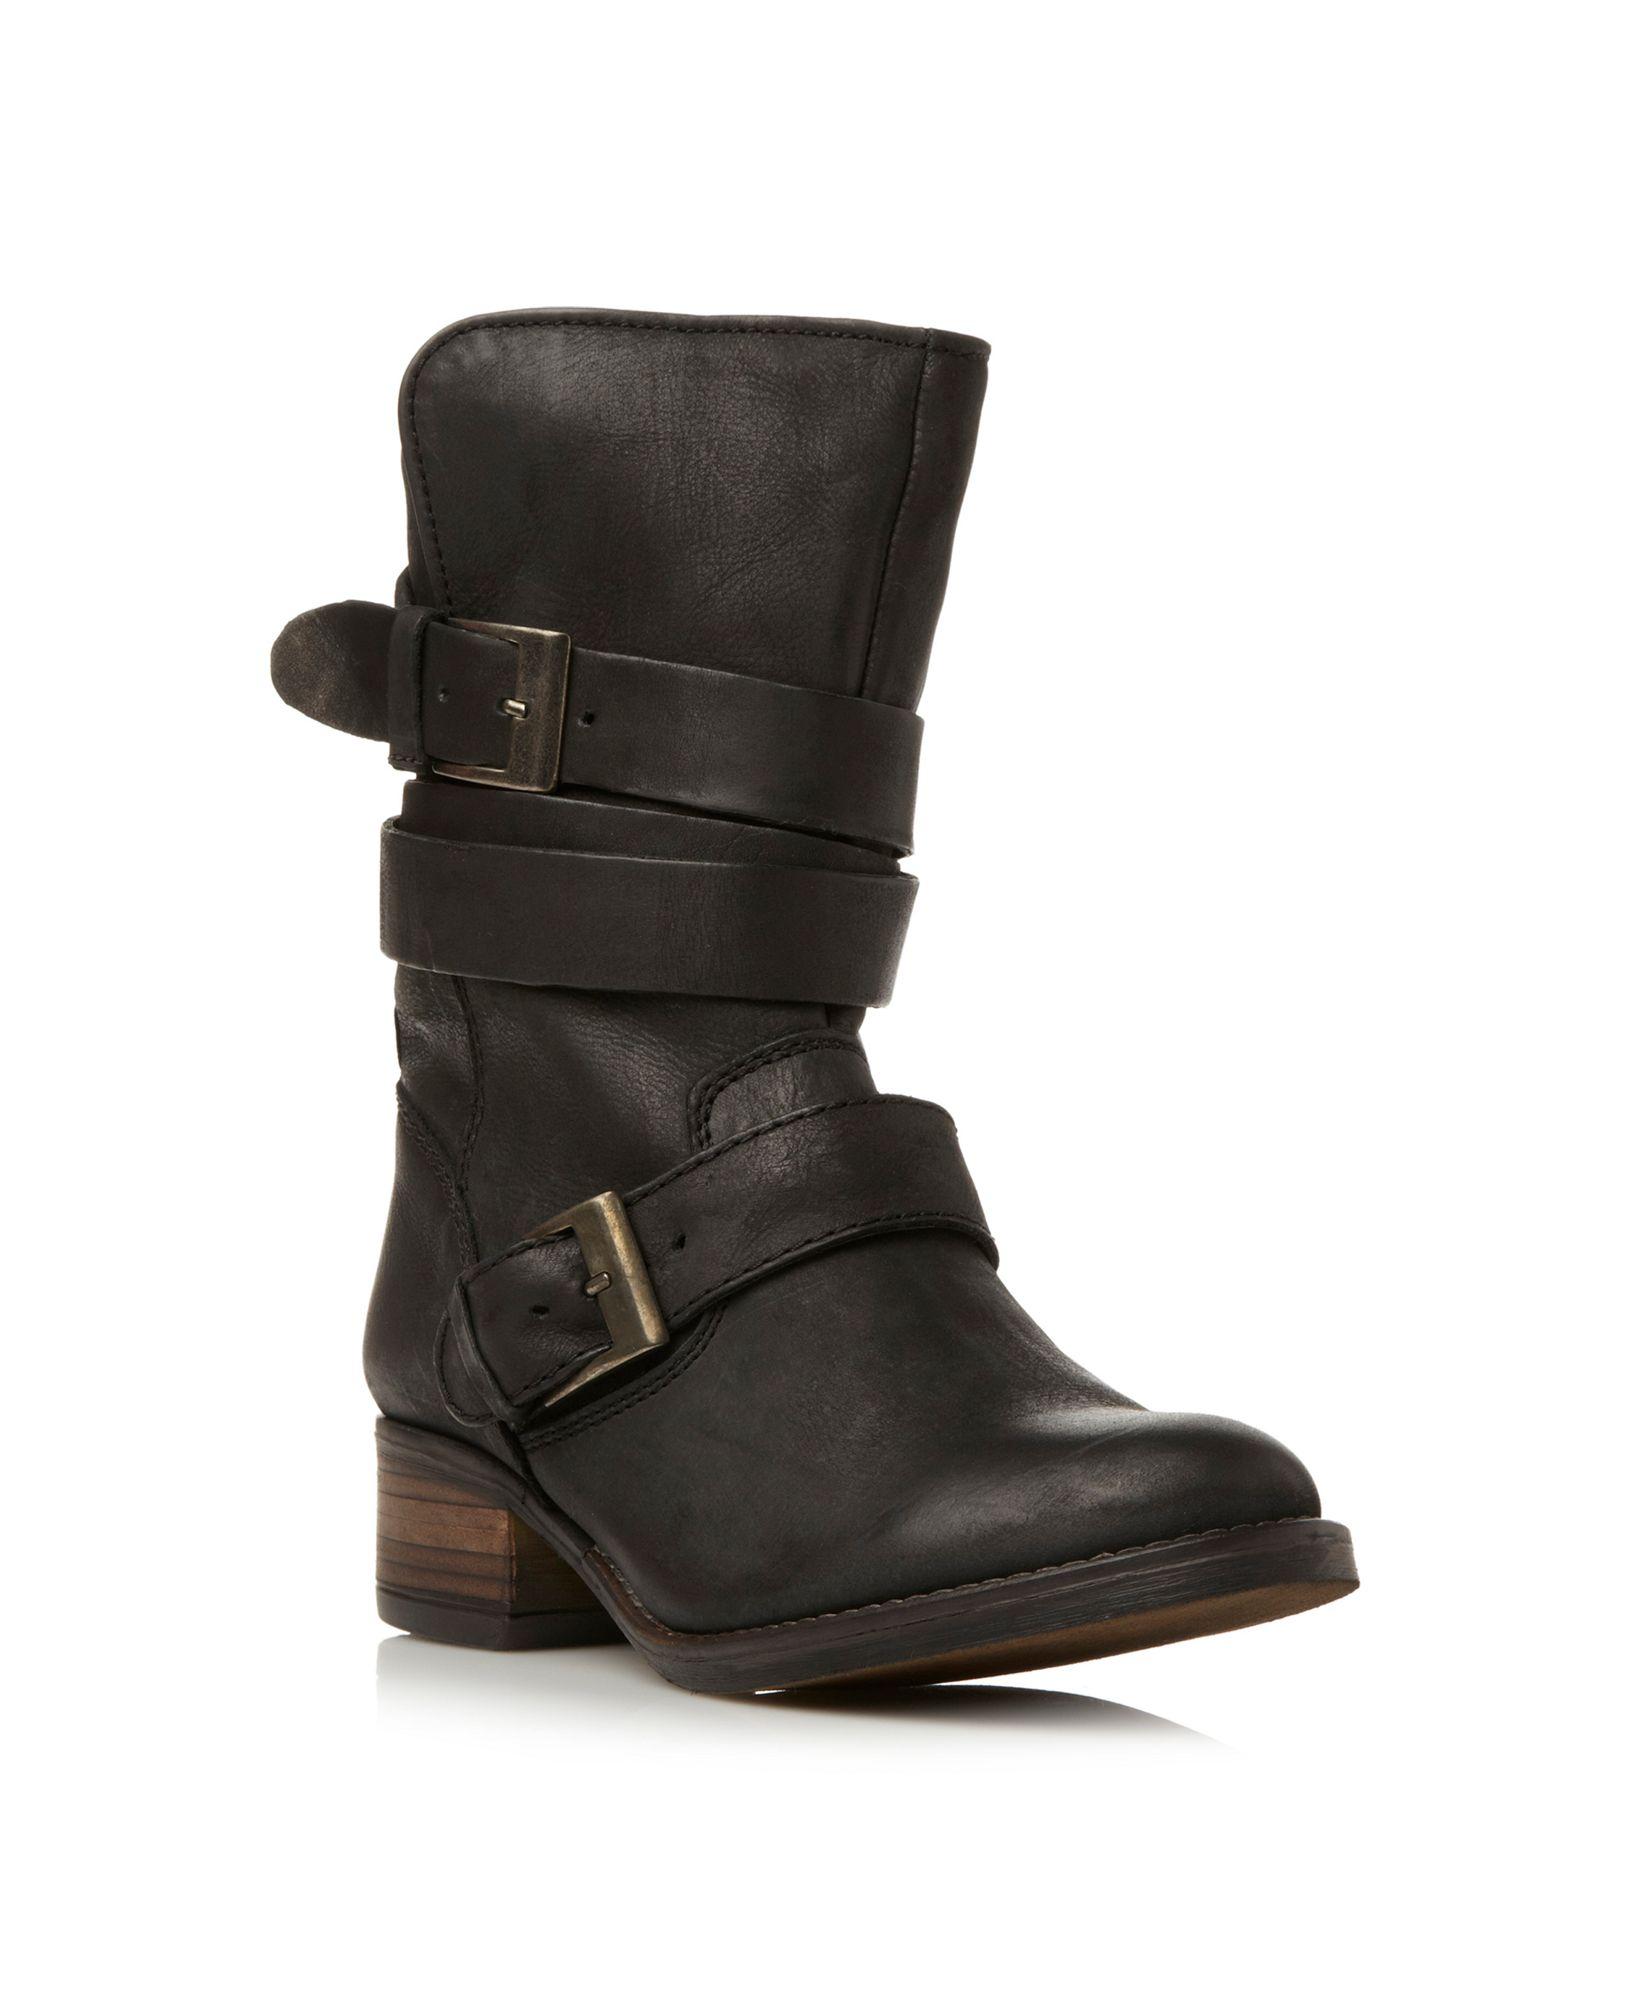 steve madden brewzer detail boots in black black